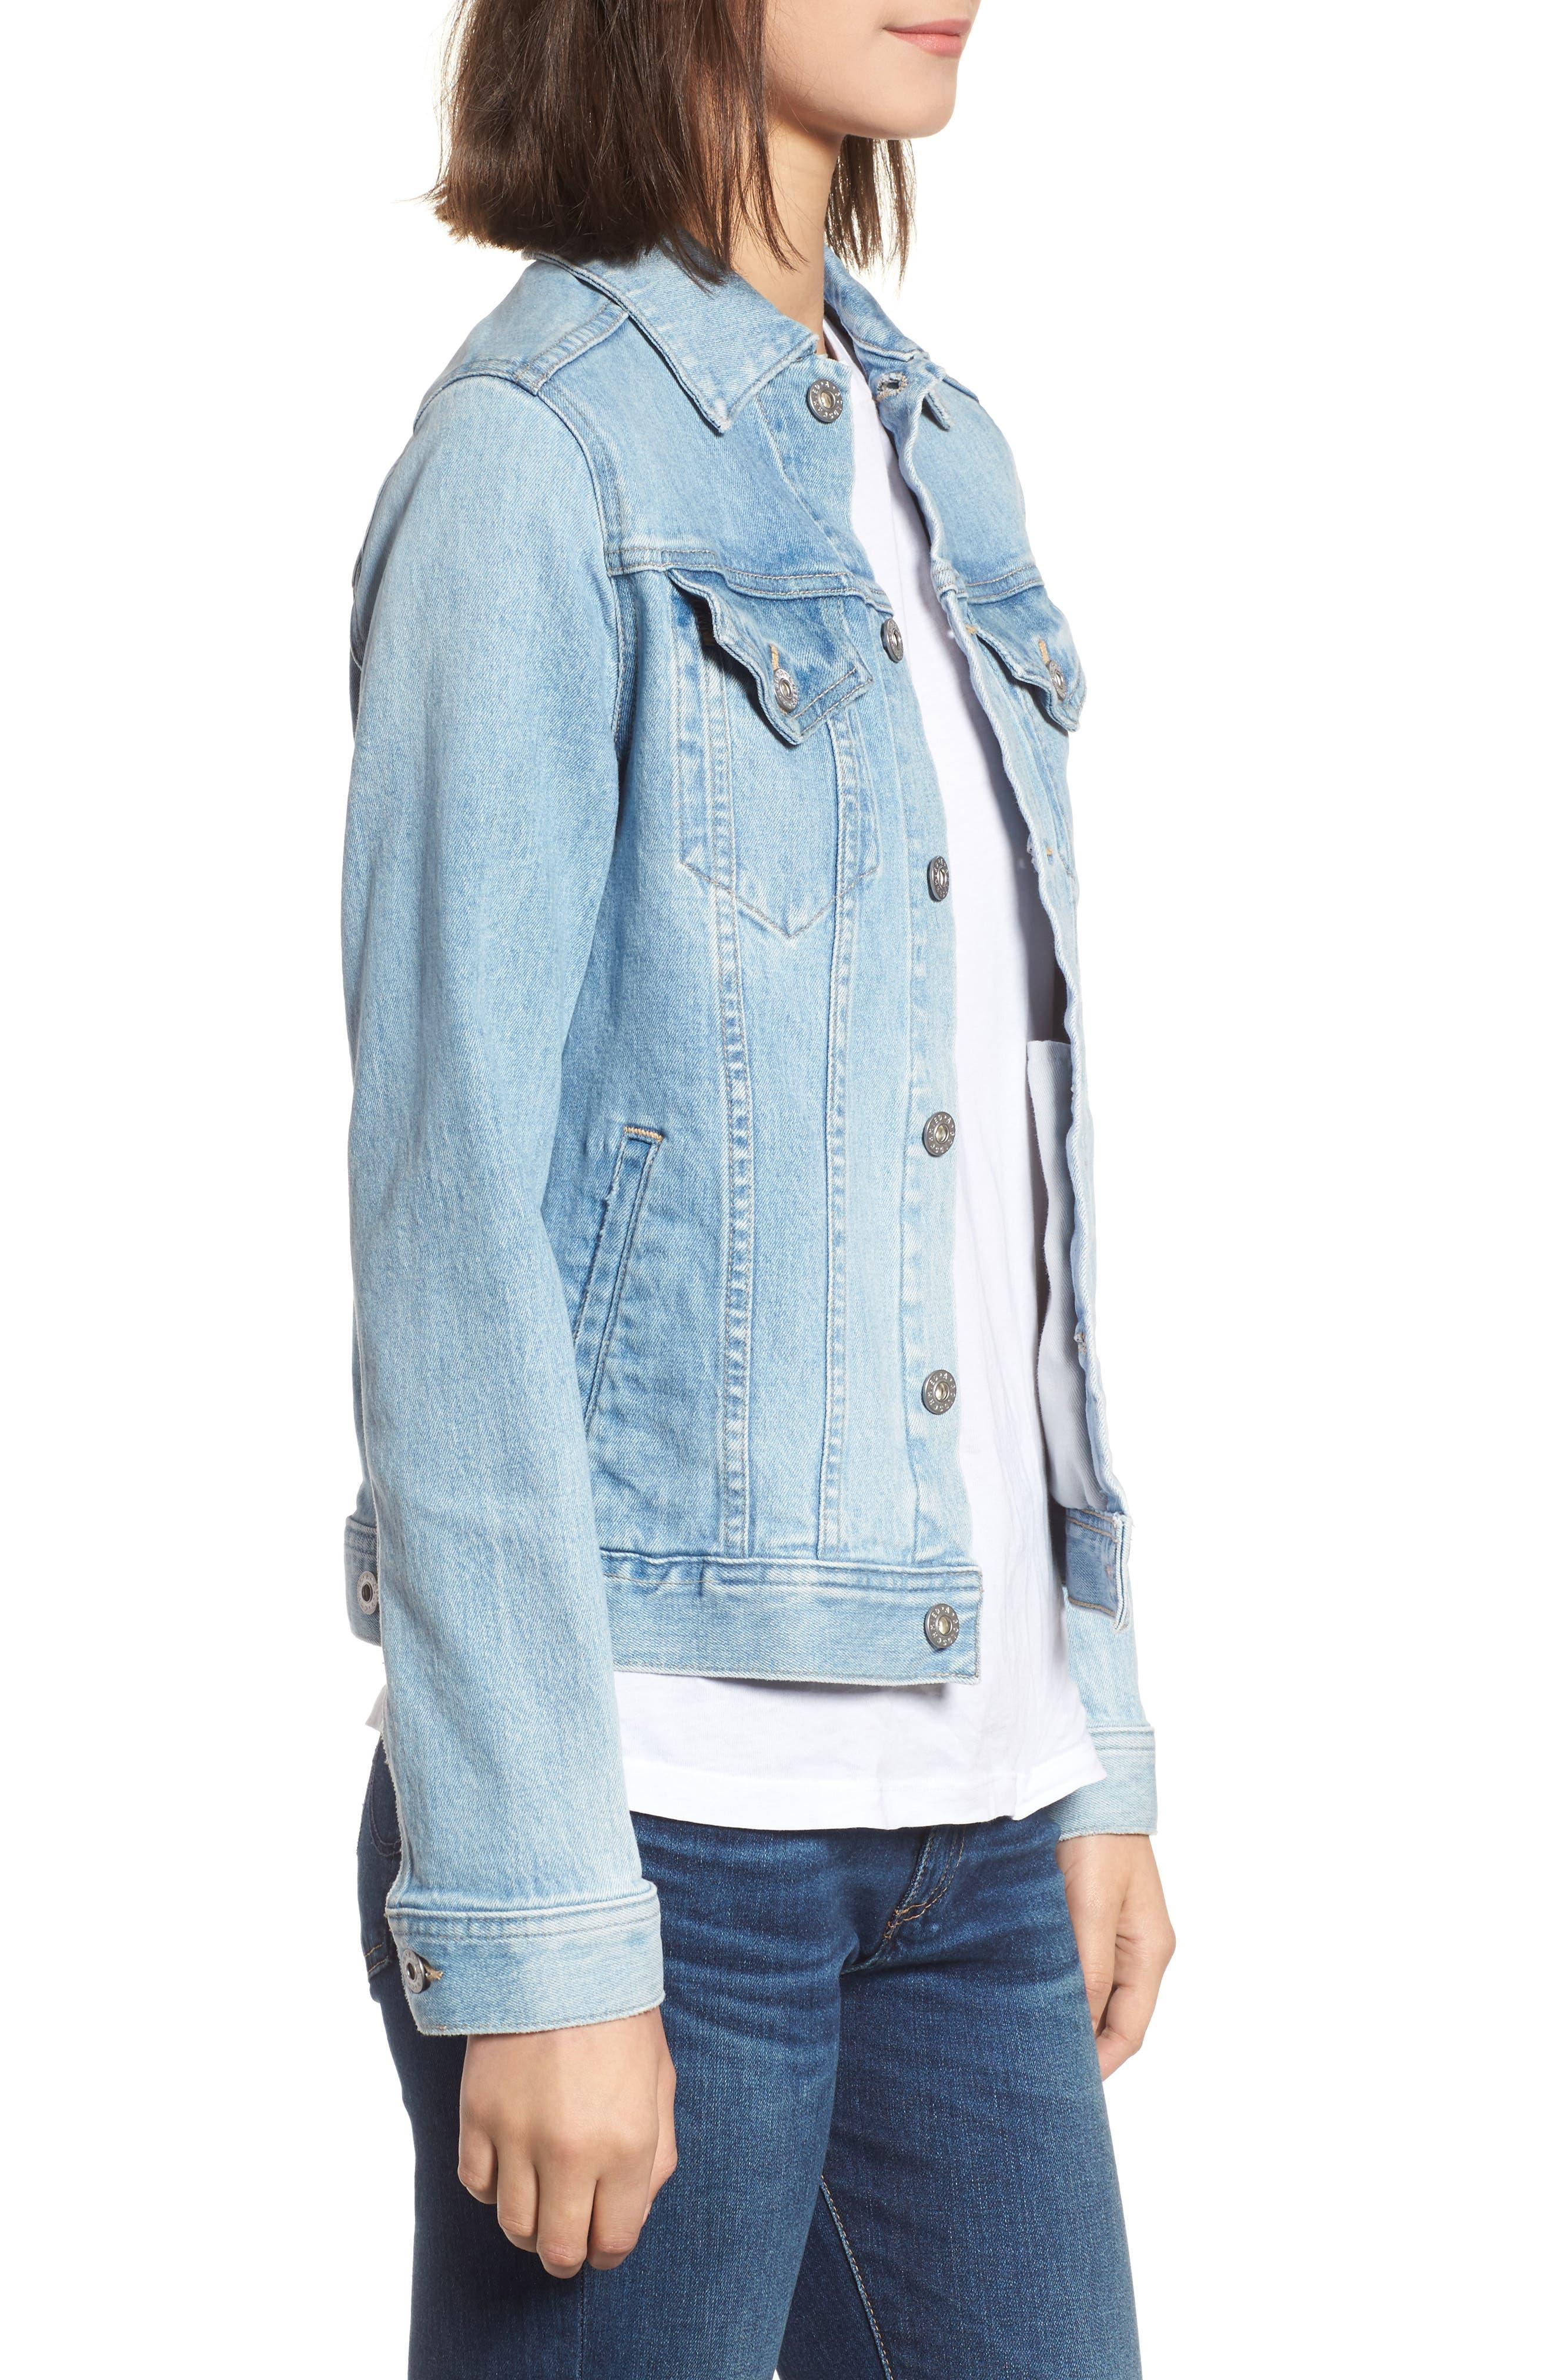 Mya Denim Jacket,                             Alternate thumbnail 3, color,                             Sunlight Blue